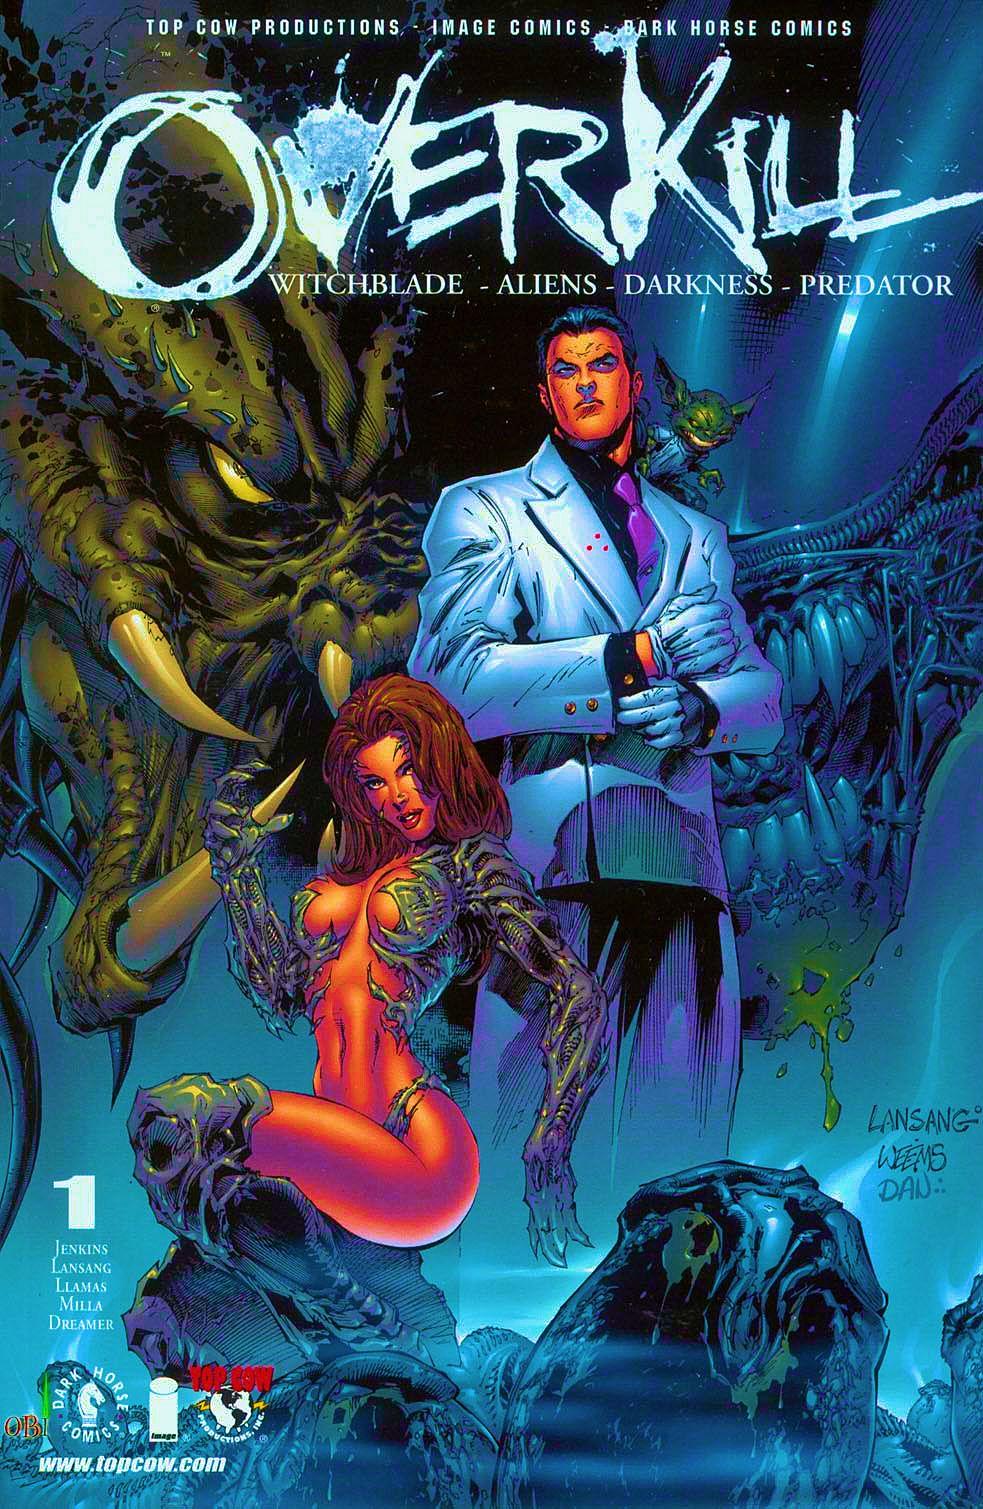 Read online Overkill: Witchblade/Aliens/Darkness/Predator comic -  Issue #1 - 1